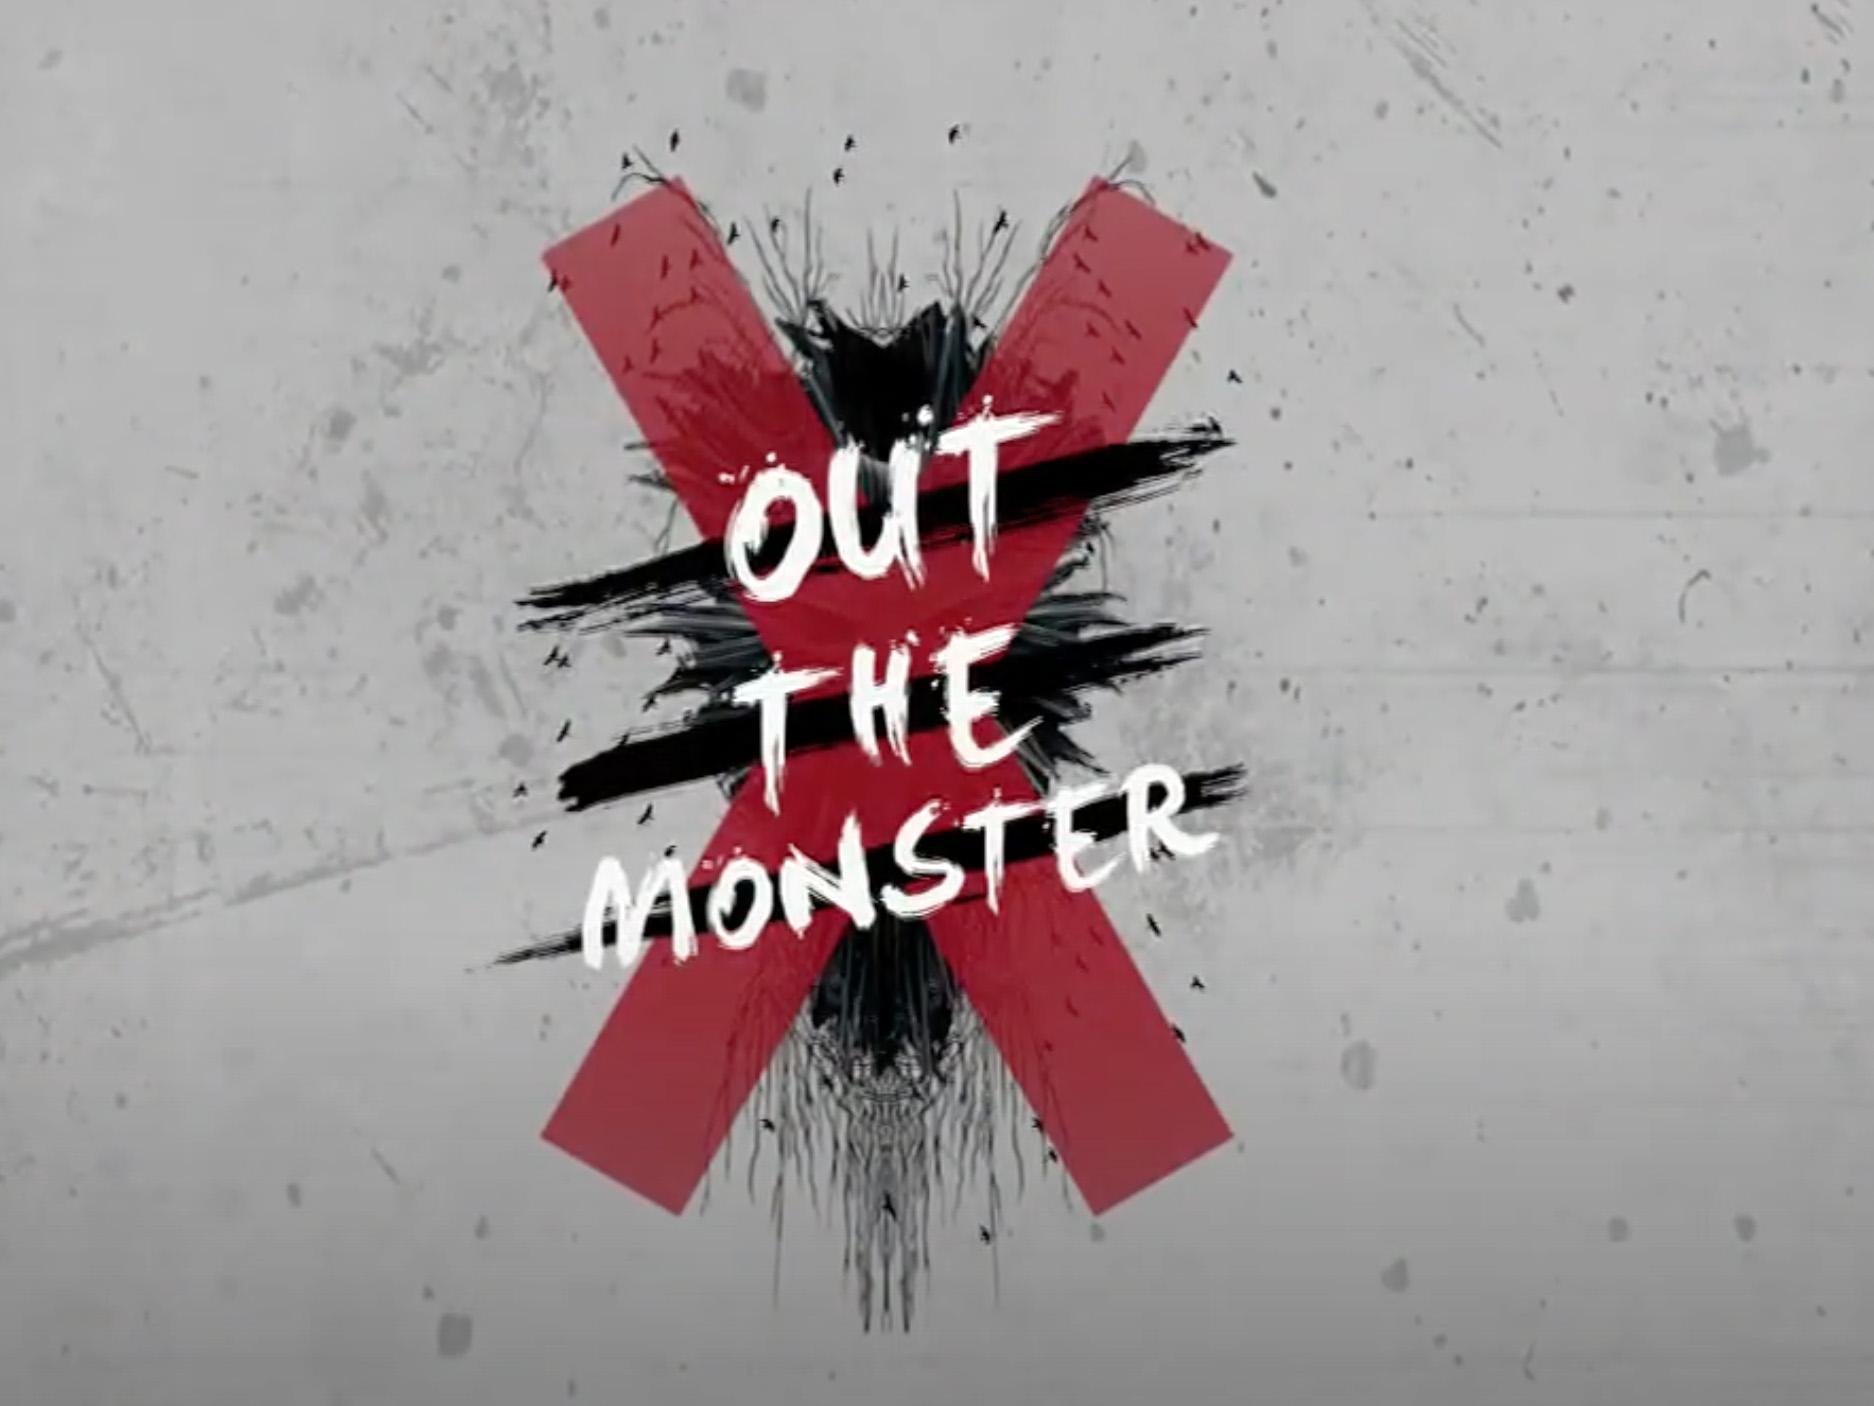 Image: https://a.storyblok.com/f/114448/1874x1406/6606348f3a/orexo-out-the-monster-4x3.jpg